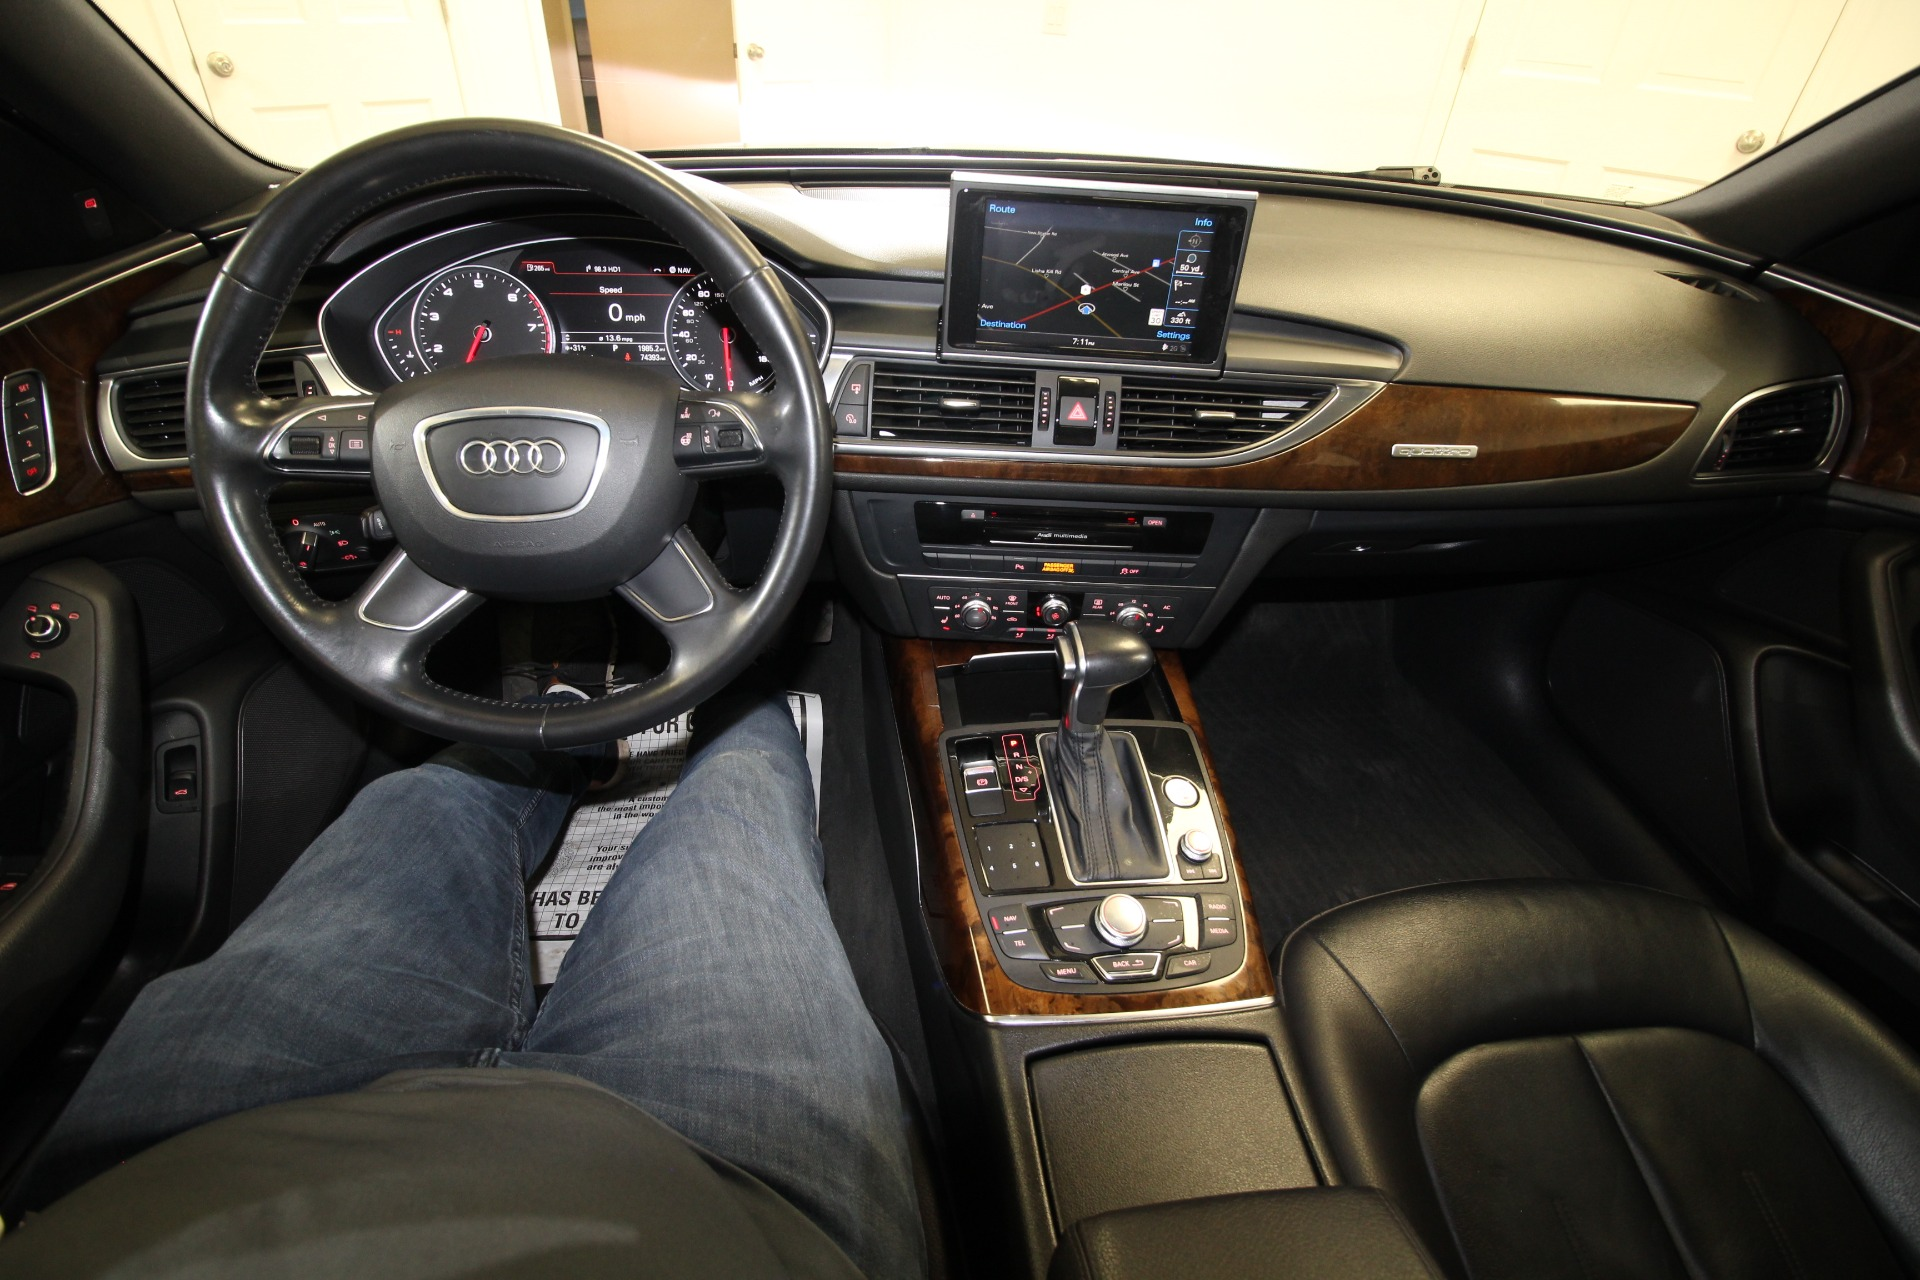 Used 2013 Audi A6 2.0T QUATTRO PREMIUM PLUS VERY CLEAN LOCAL CAR | Albany, NY